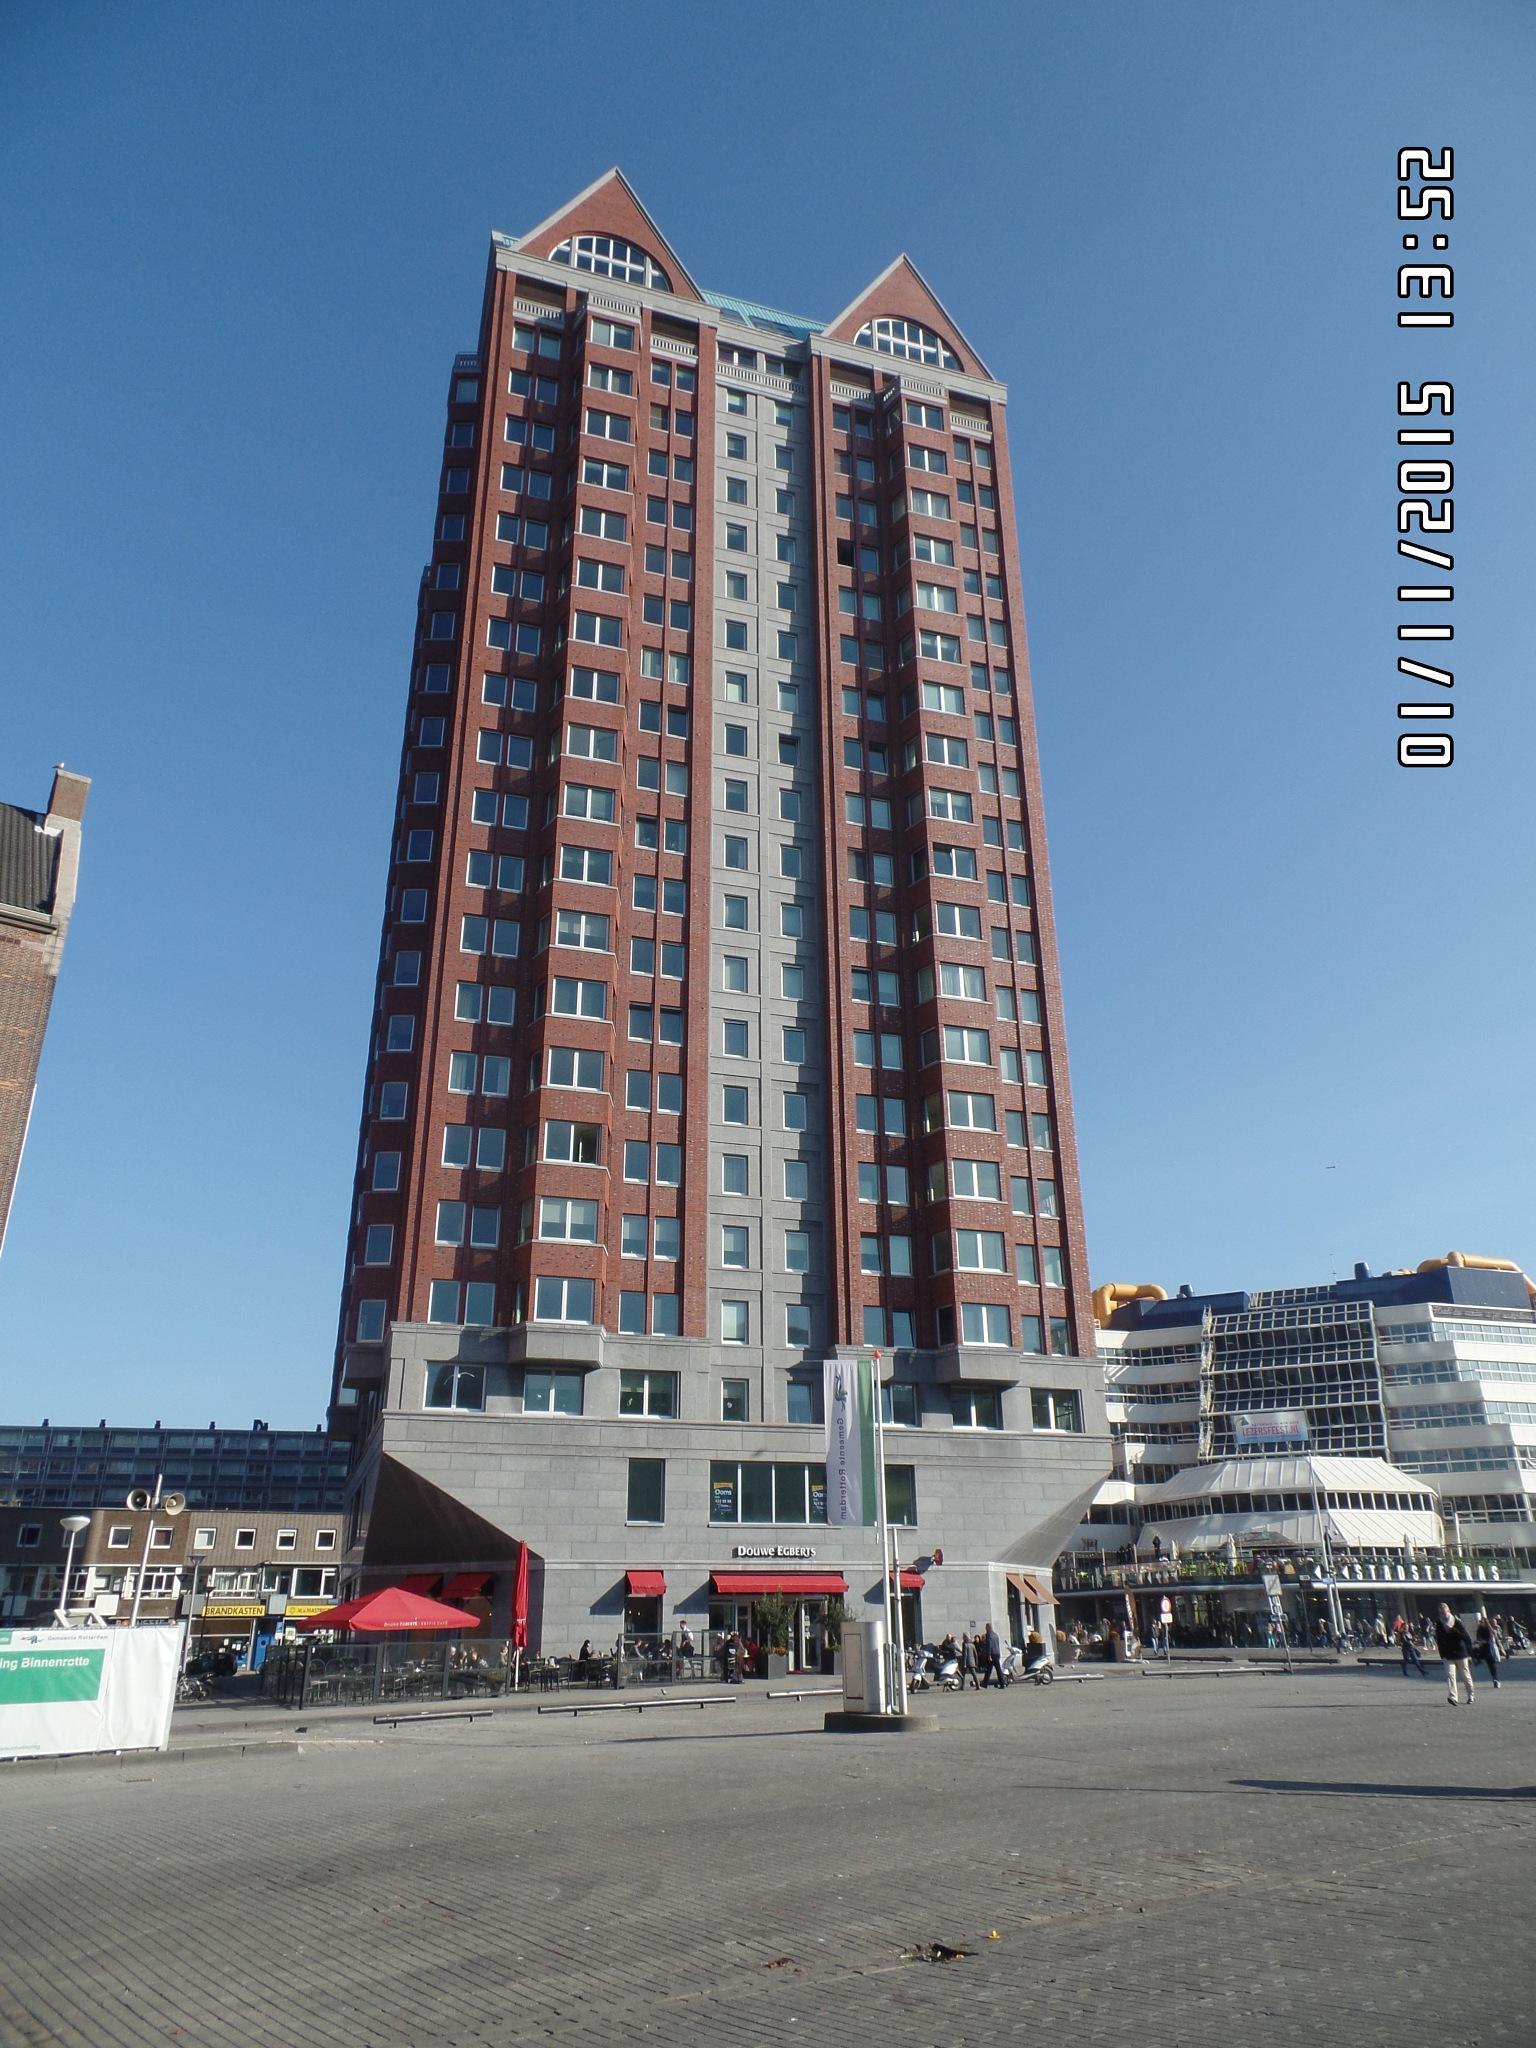 Rotterdam by ingrid1960